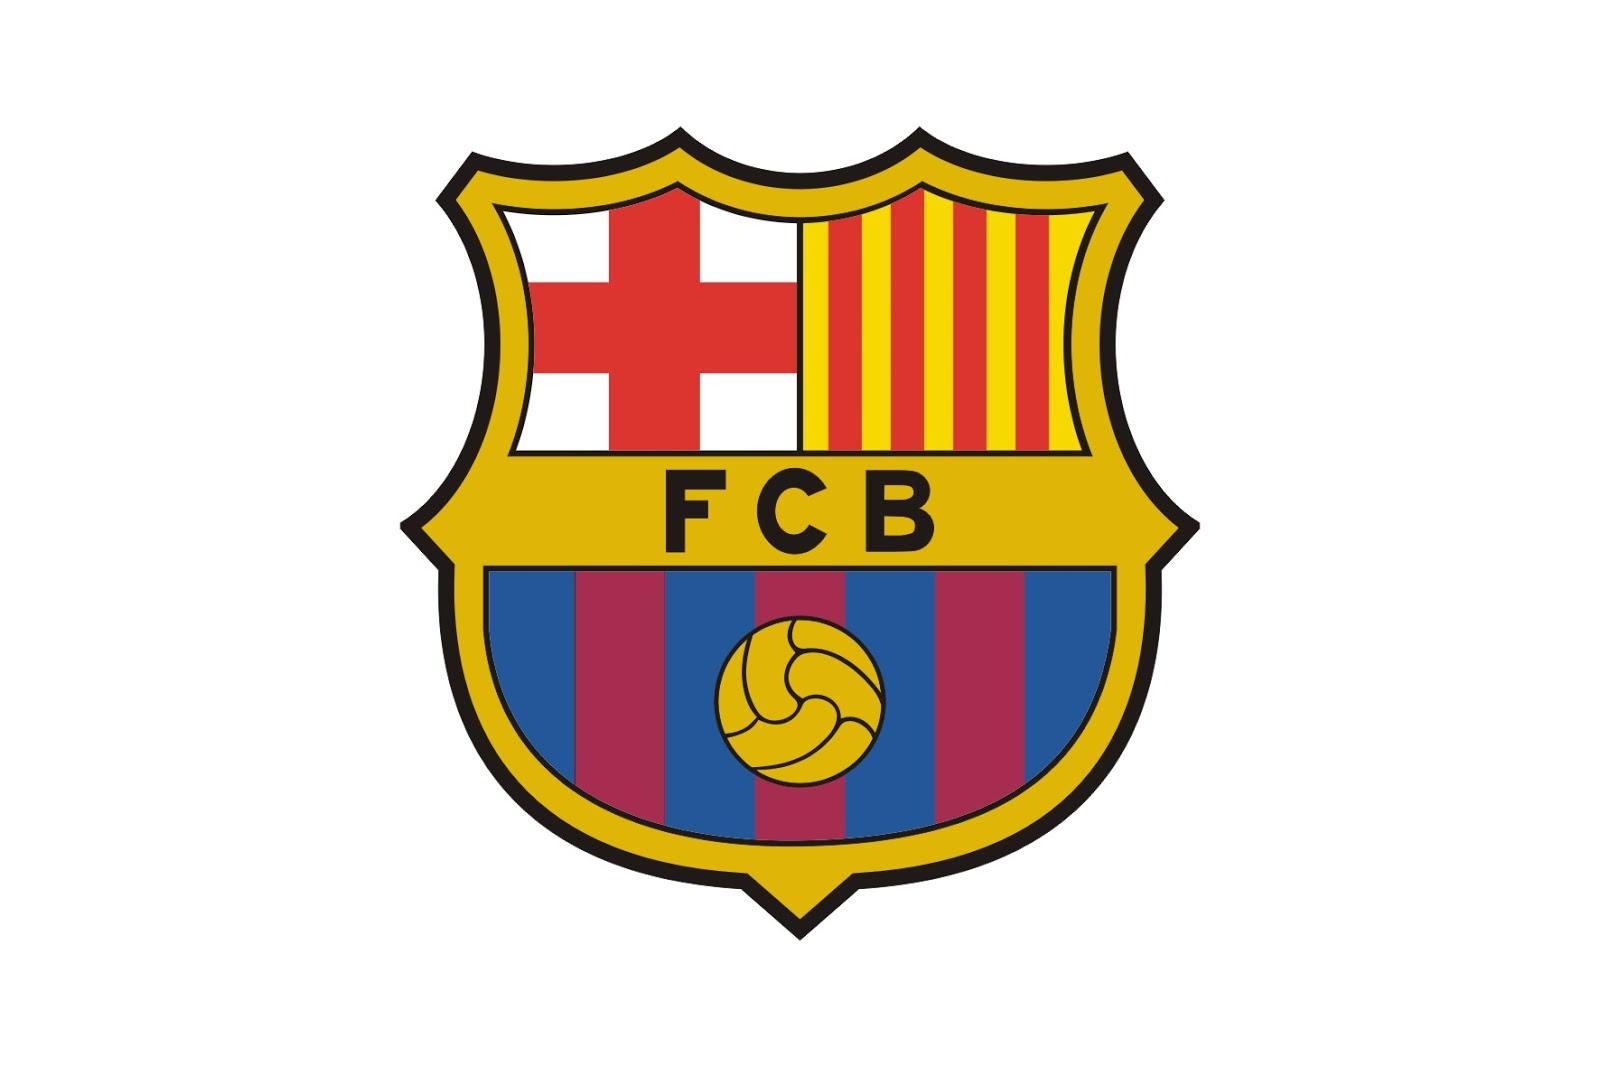 Barca logo Wallpaper